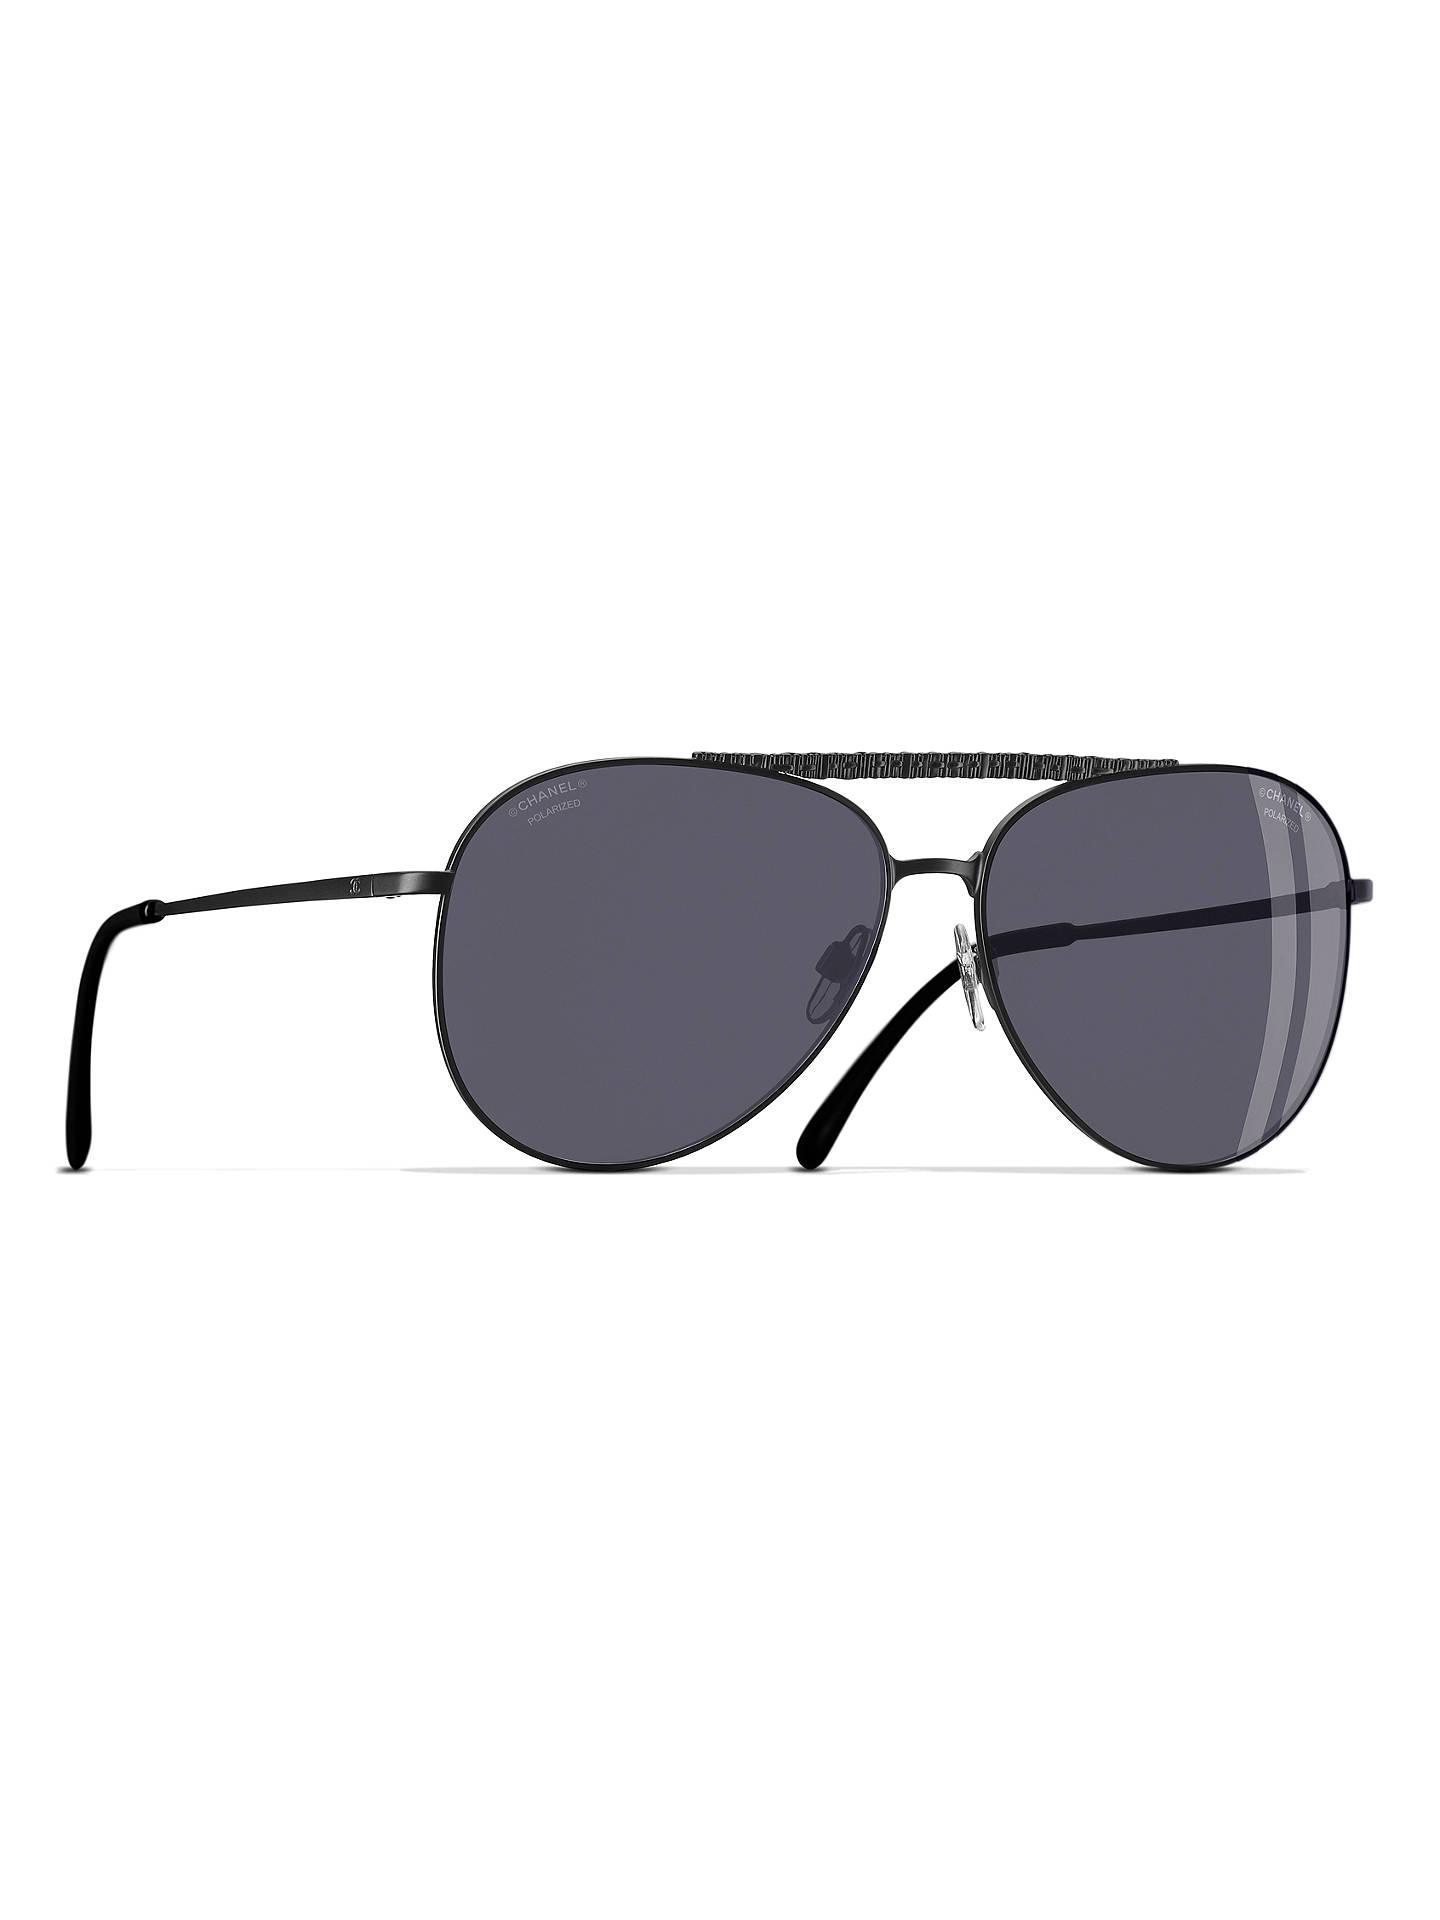 5587029049 Buy CHANEL Polarised Pilot Sunglasses CH4231 Black Online at johnlewis.com  ...